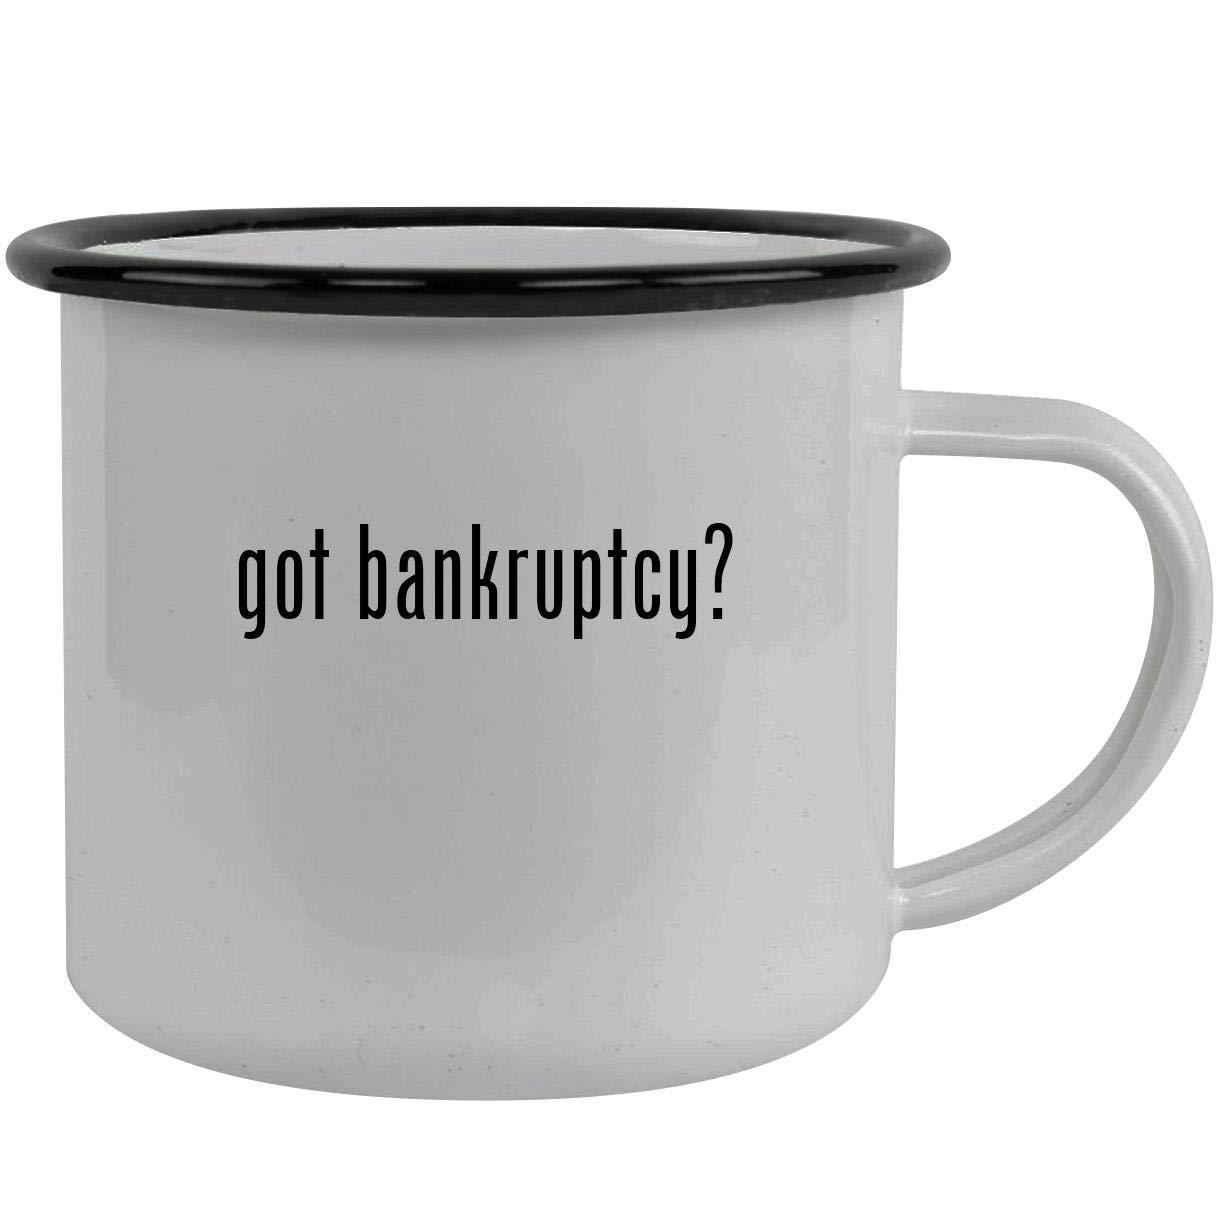 got bankruptcy? - Stainless Steel 12oz Camping Mug, Black